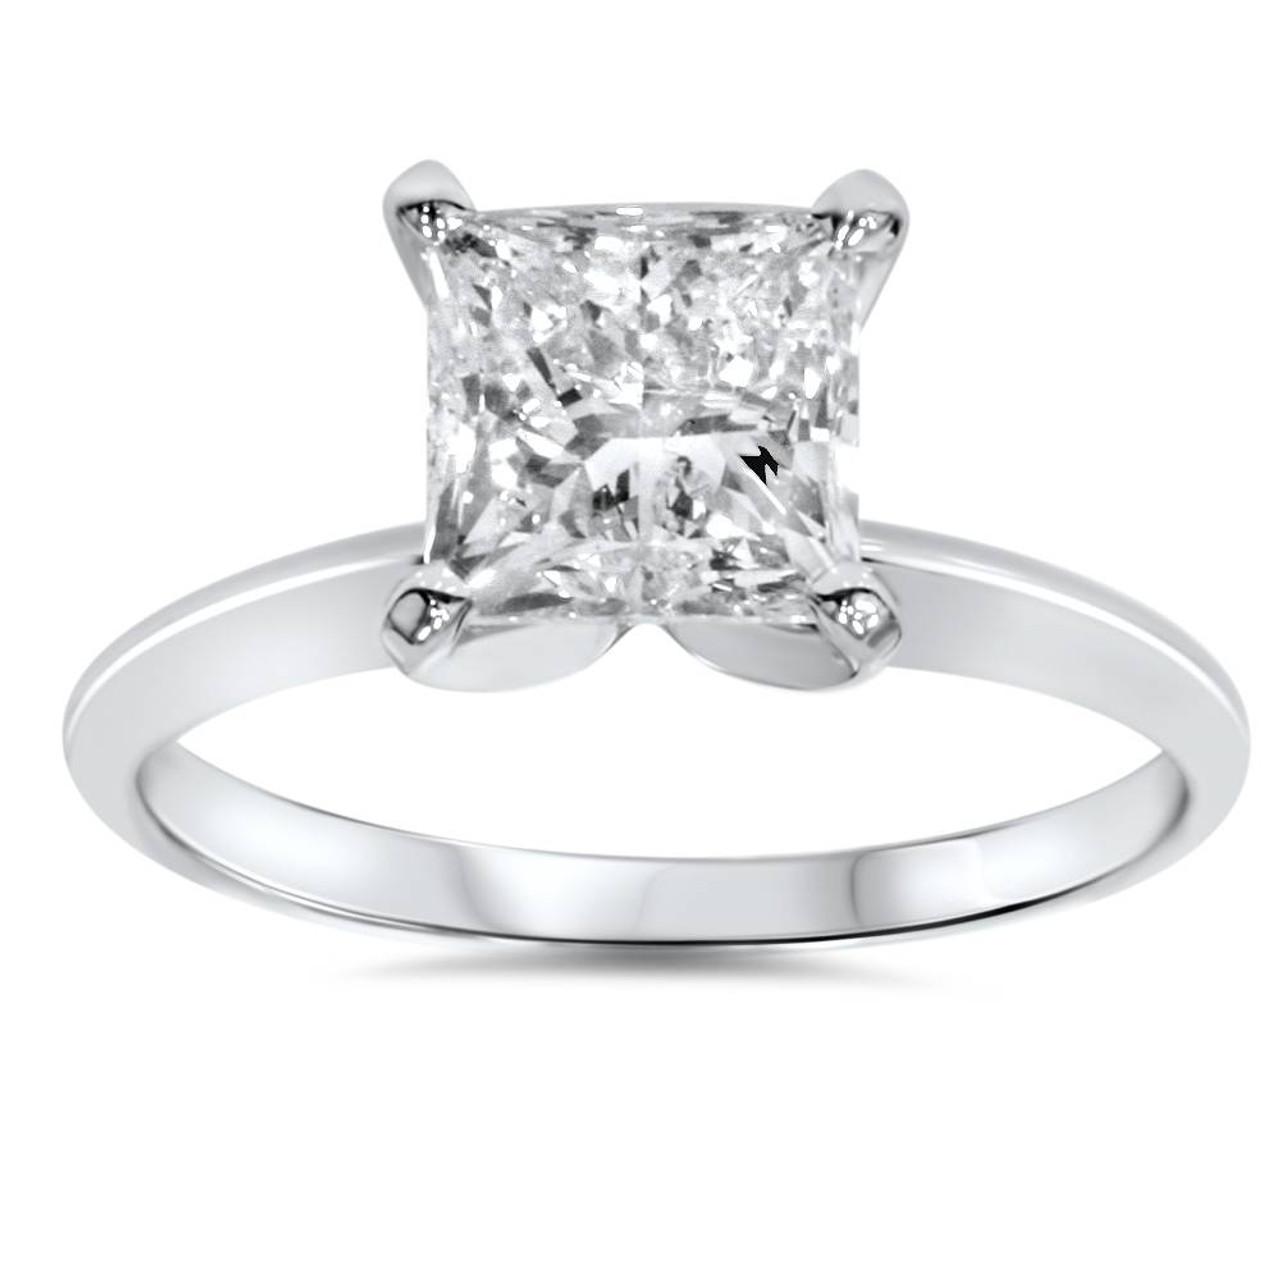 1ct Solitaire Princess Cut Diamond Engagement Ring 14k White Gold